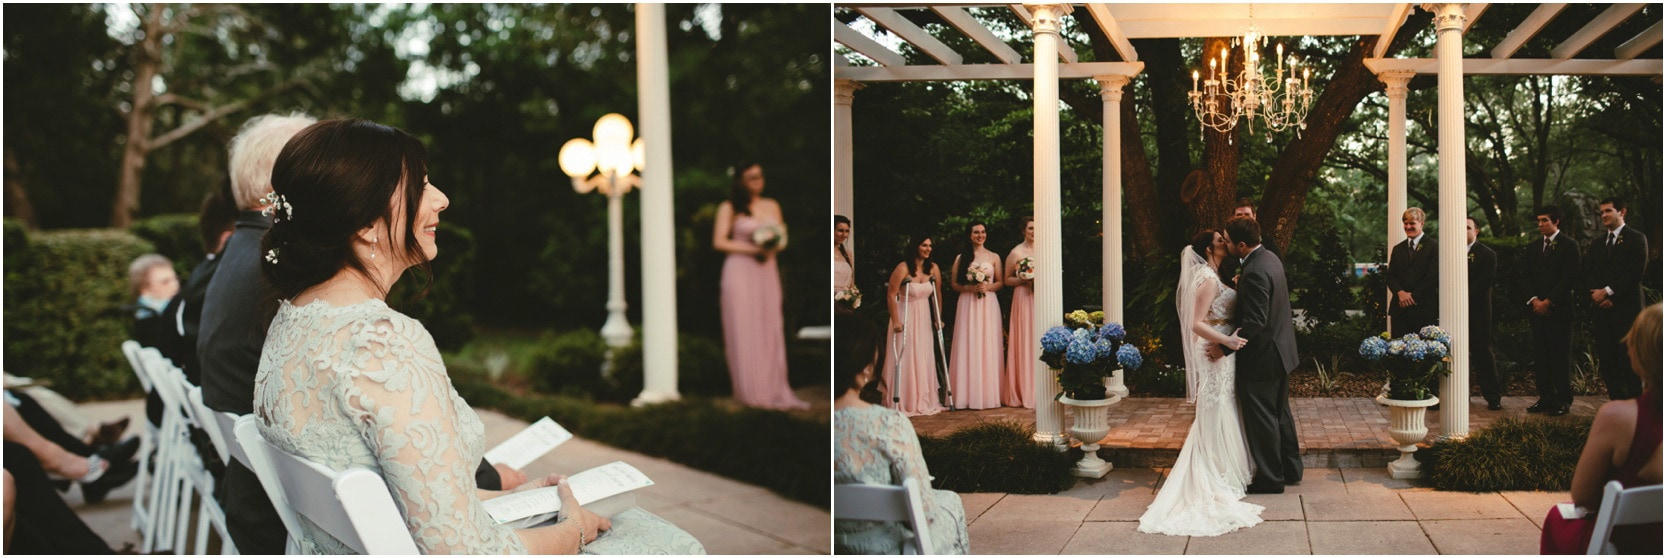 naomijacob_covington_wedding__347_blogstomped